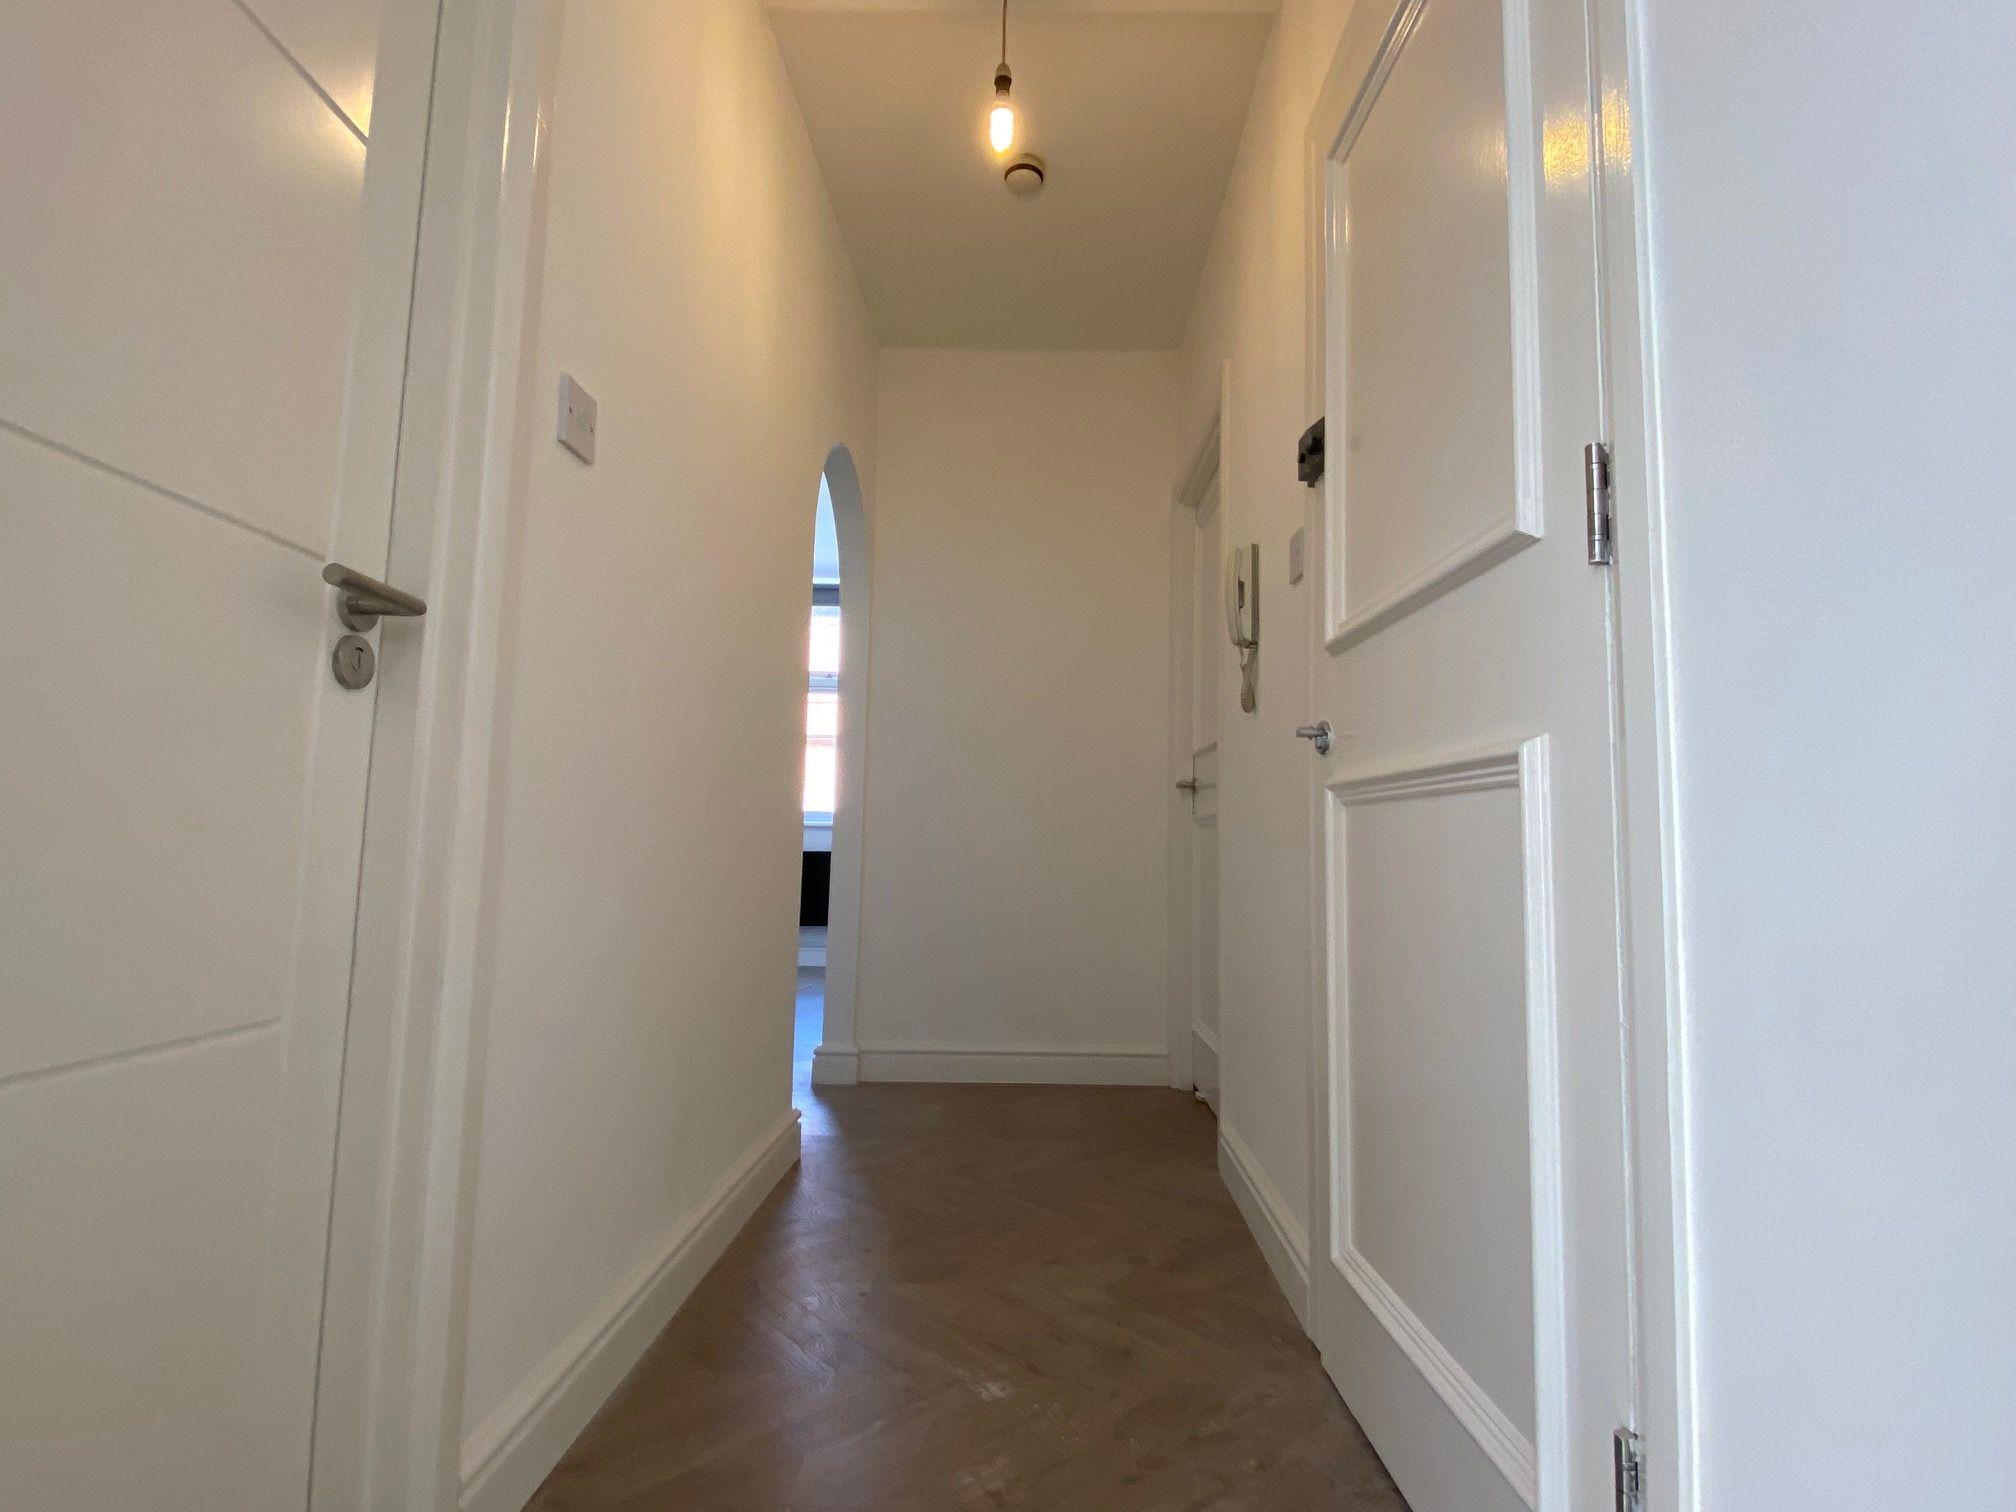 2 bedroom flat flat/apartment Let in Willesden - Entrance hallway